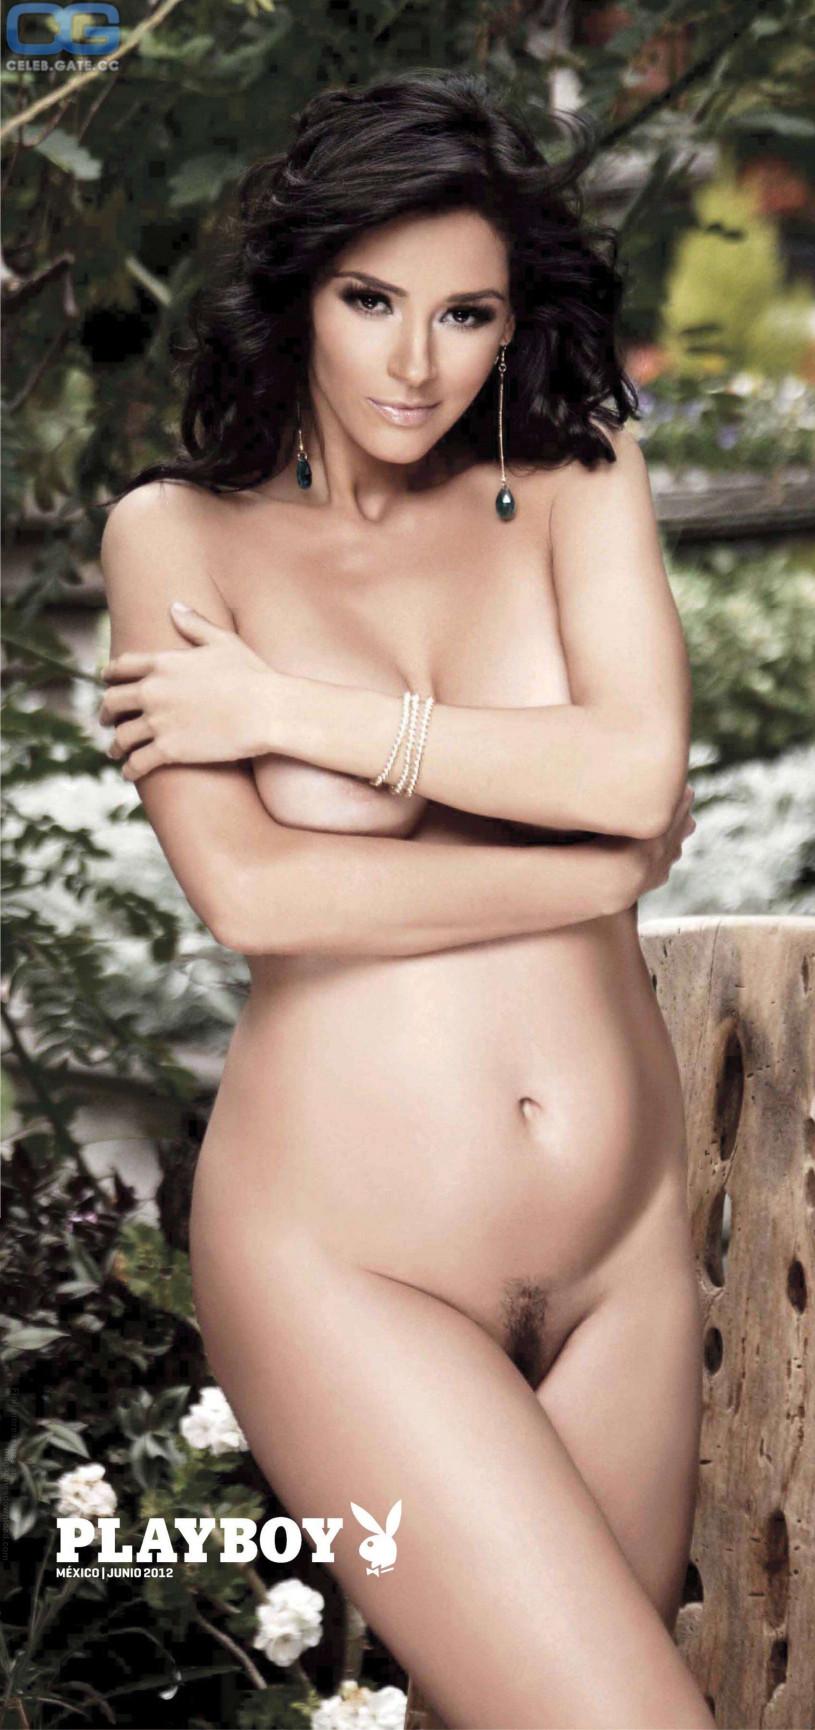 Dorismar playboy nude